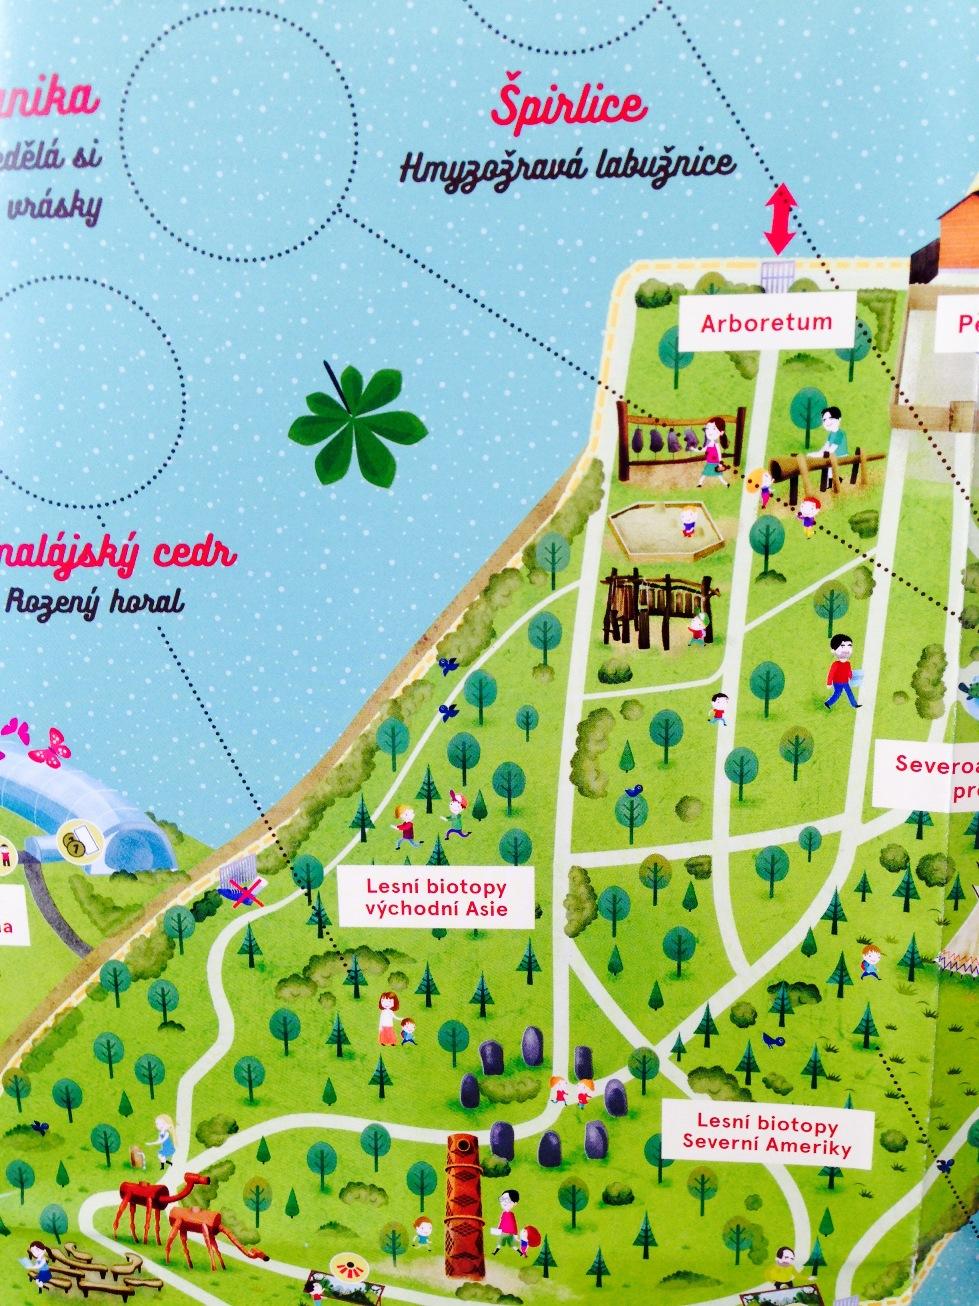 Prazska Botanicka Zahrada Laka Deti Na Novou Kreslenou Mapu Kam S